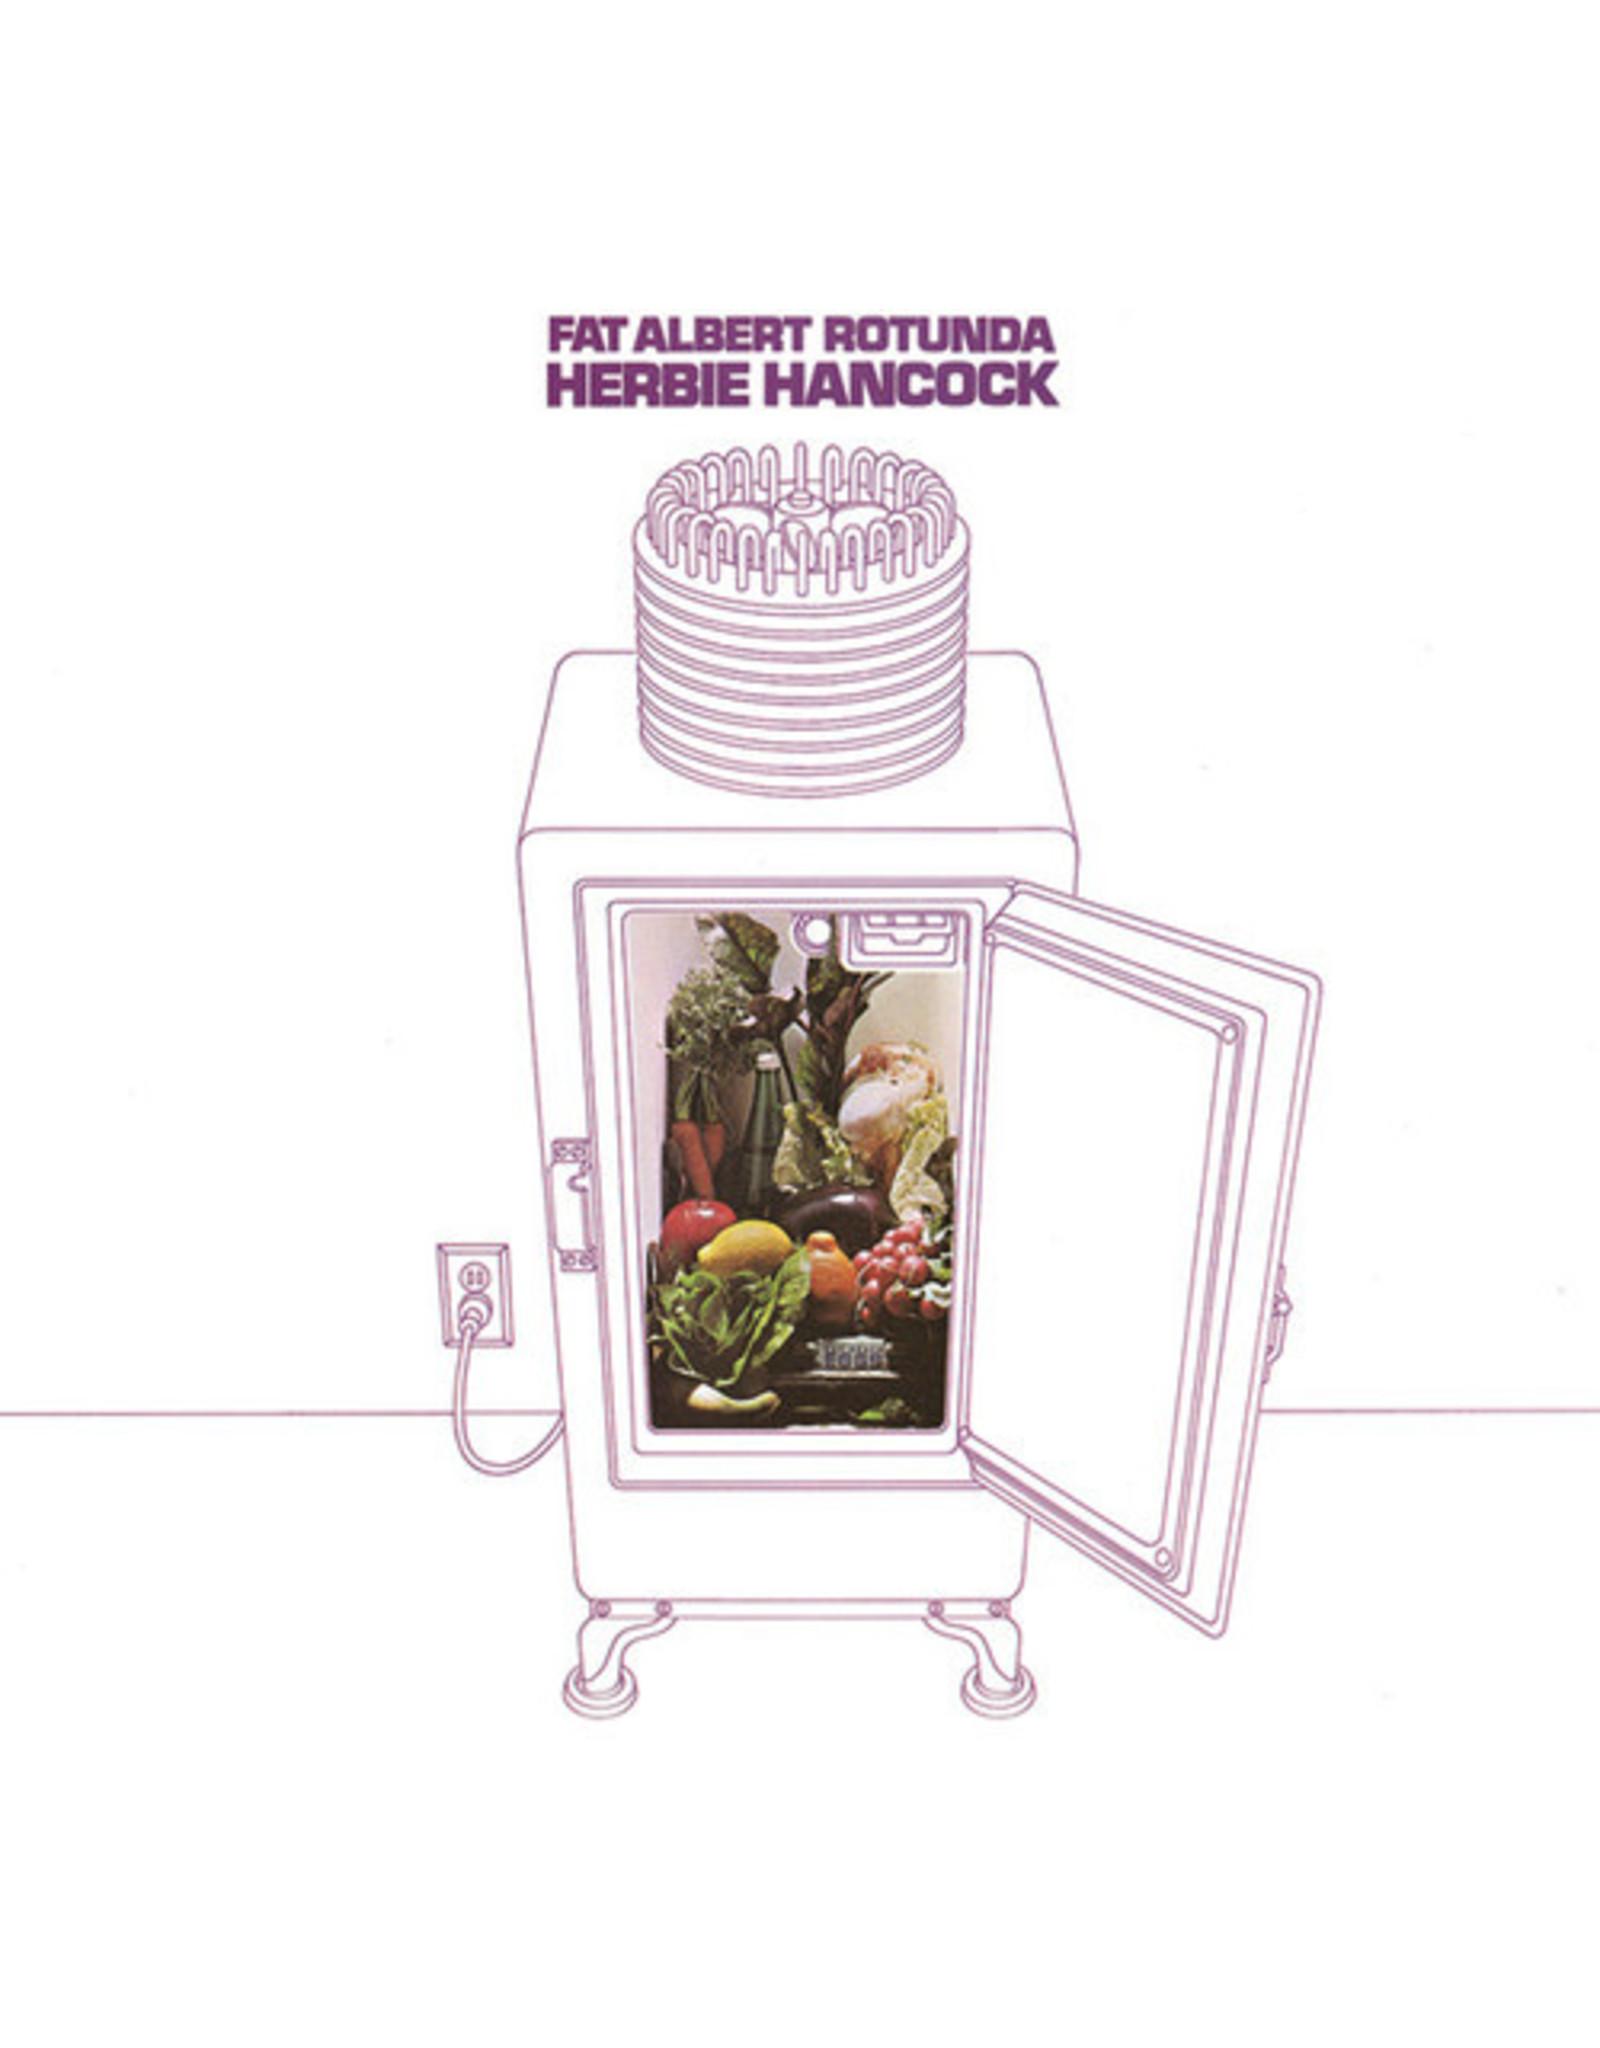 New Vinyl Herbie Hancock - Fat Albert Rotunda LP